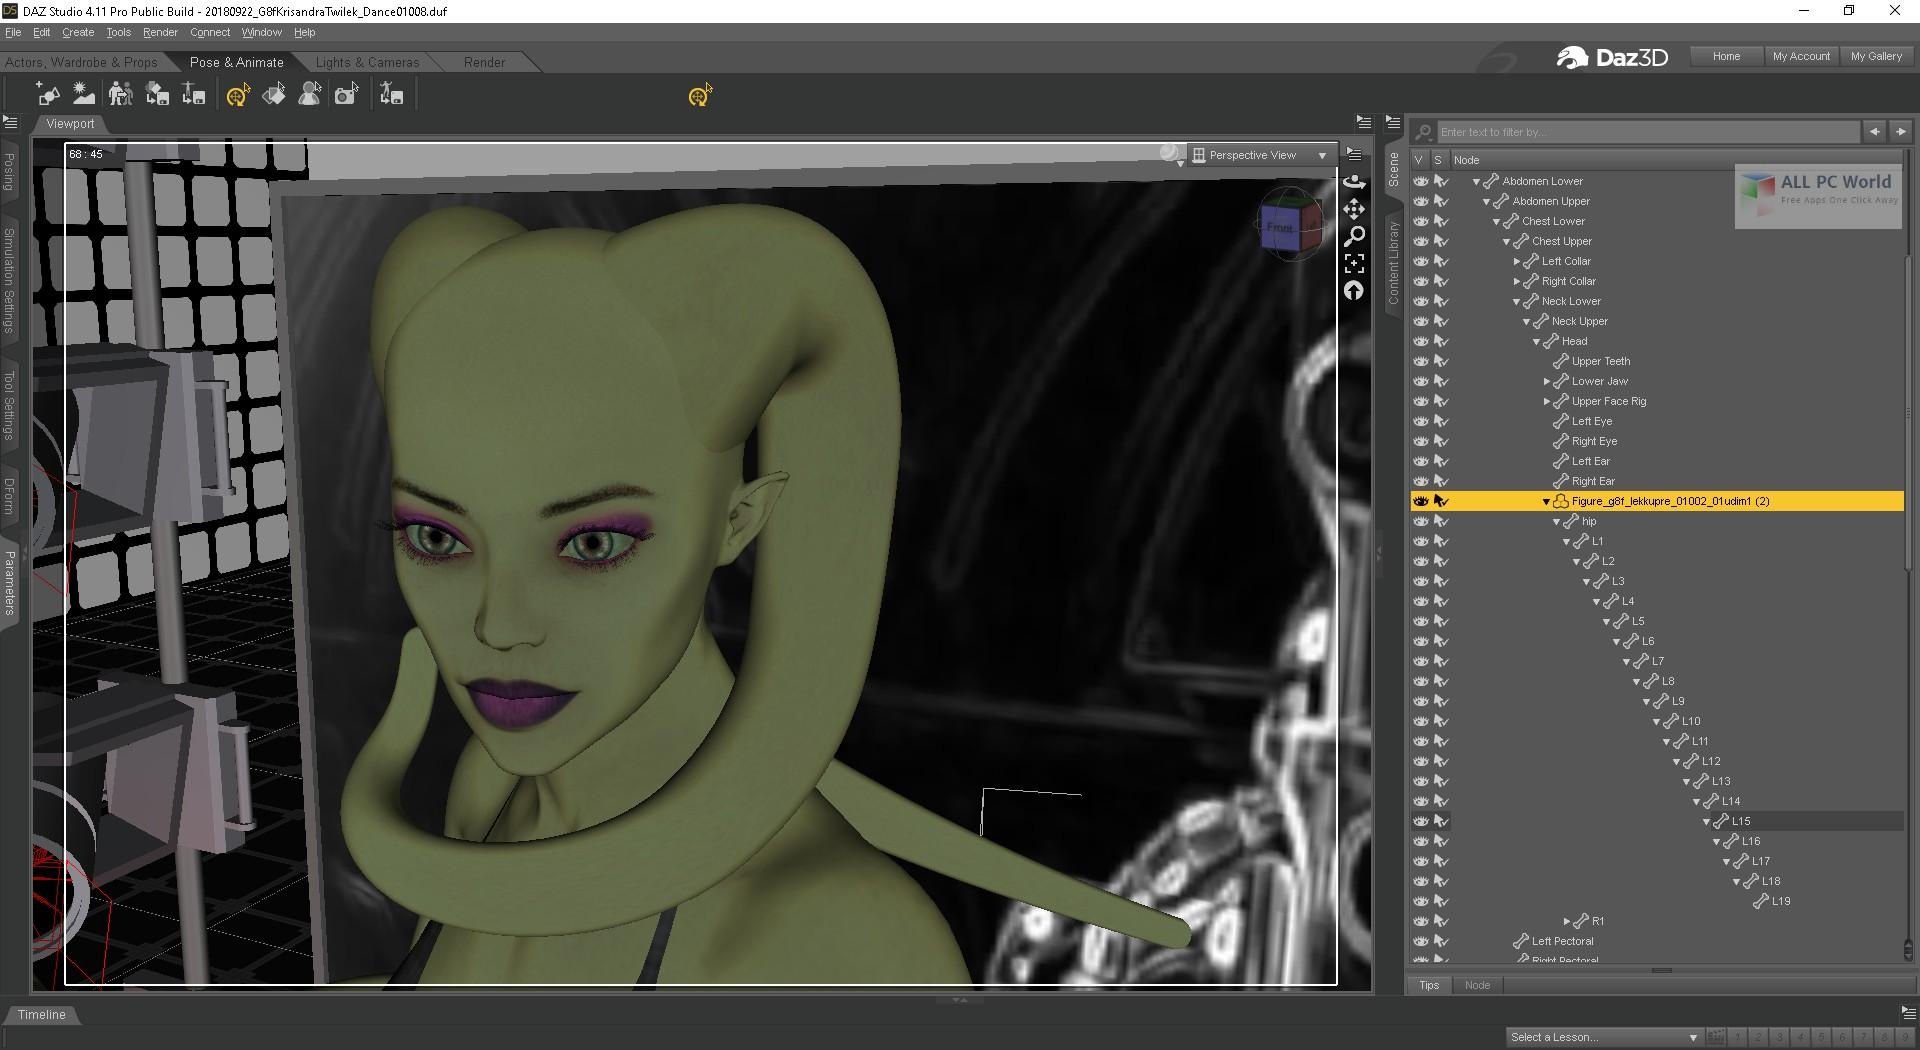 DAZ Studio Pro 2019 v4 11 Free Download - ALL PC World